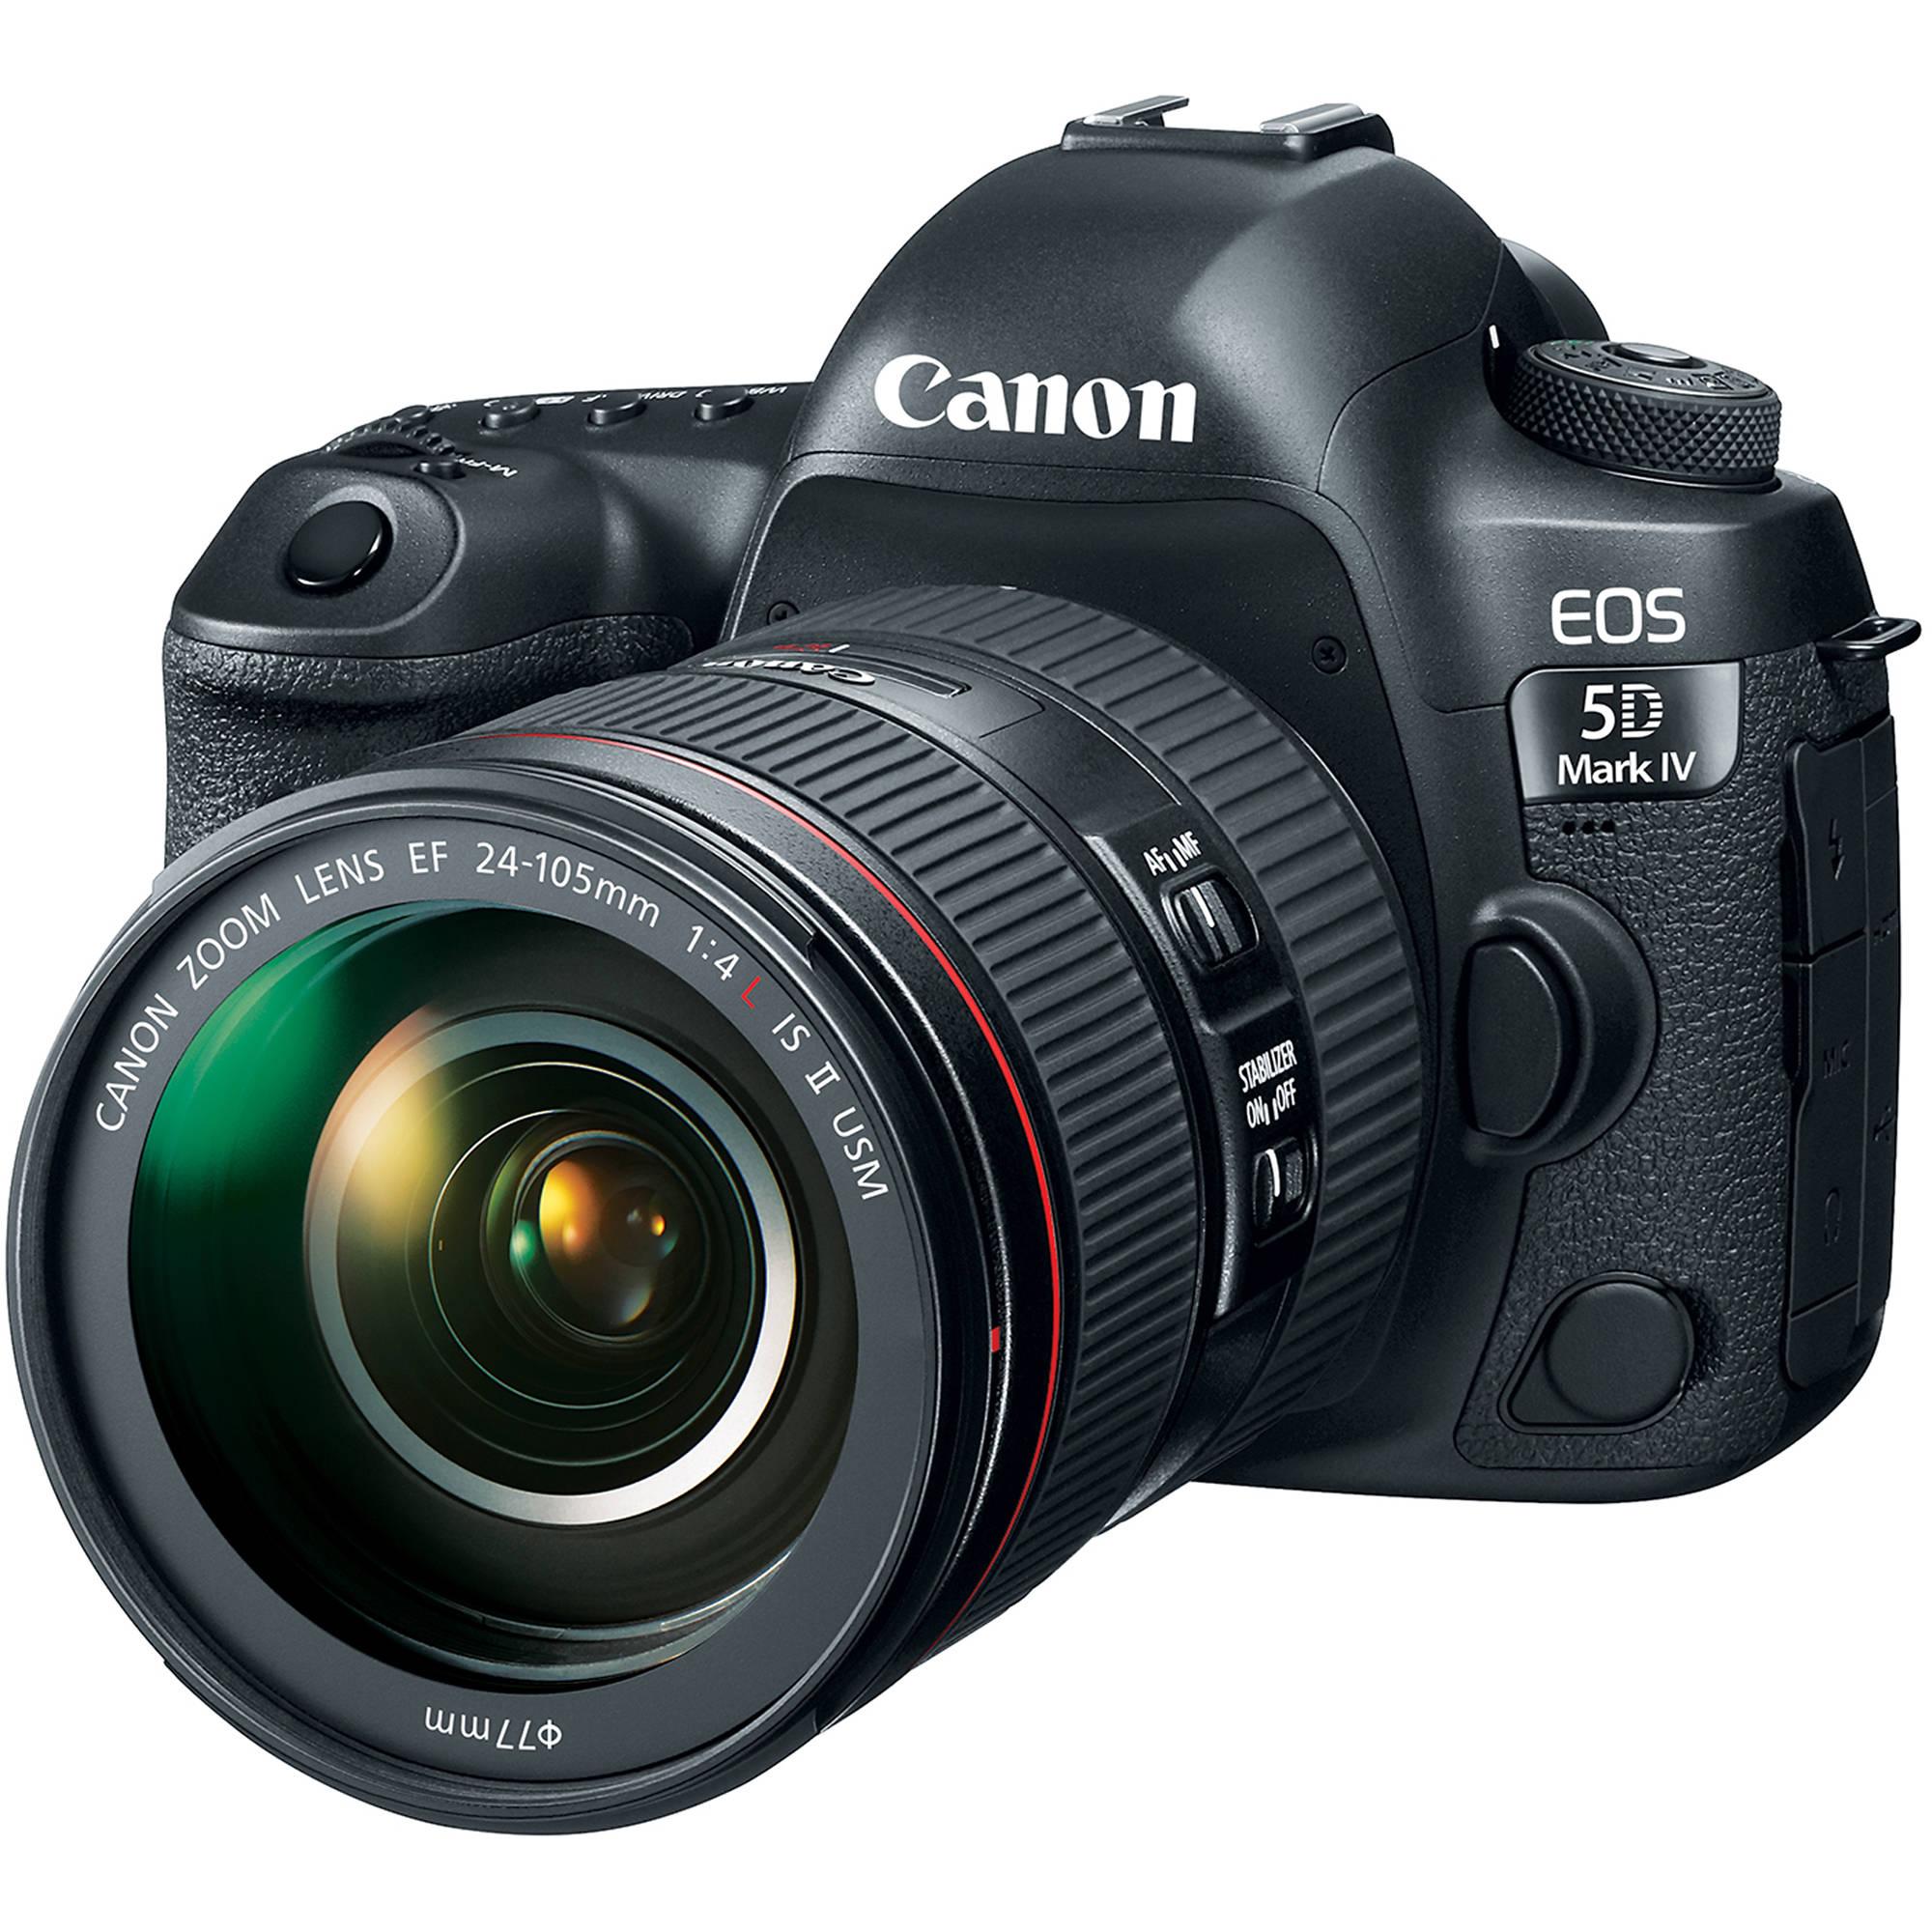 Canon 5D Mark III Digital SLR + Canon EF 24-105/4L IS USM